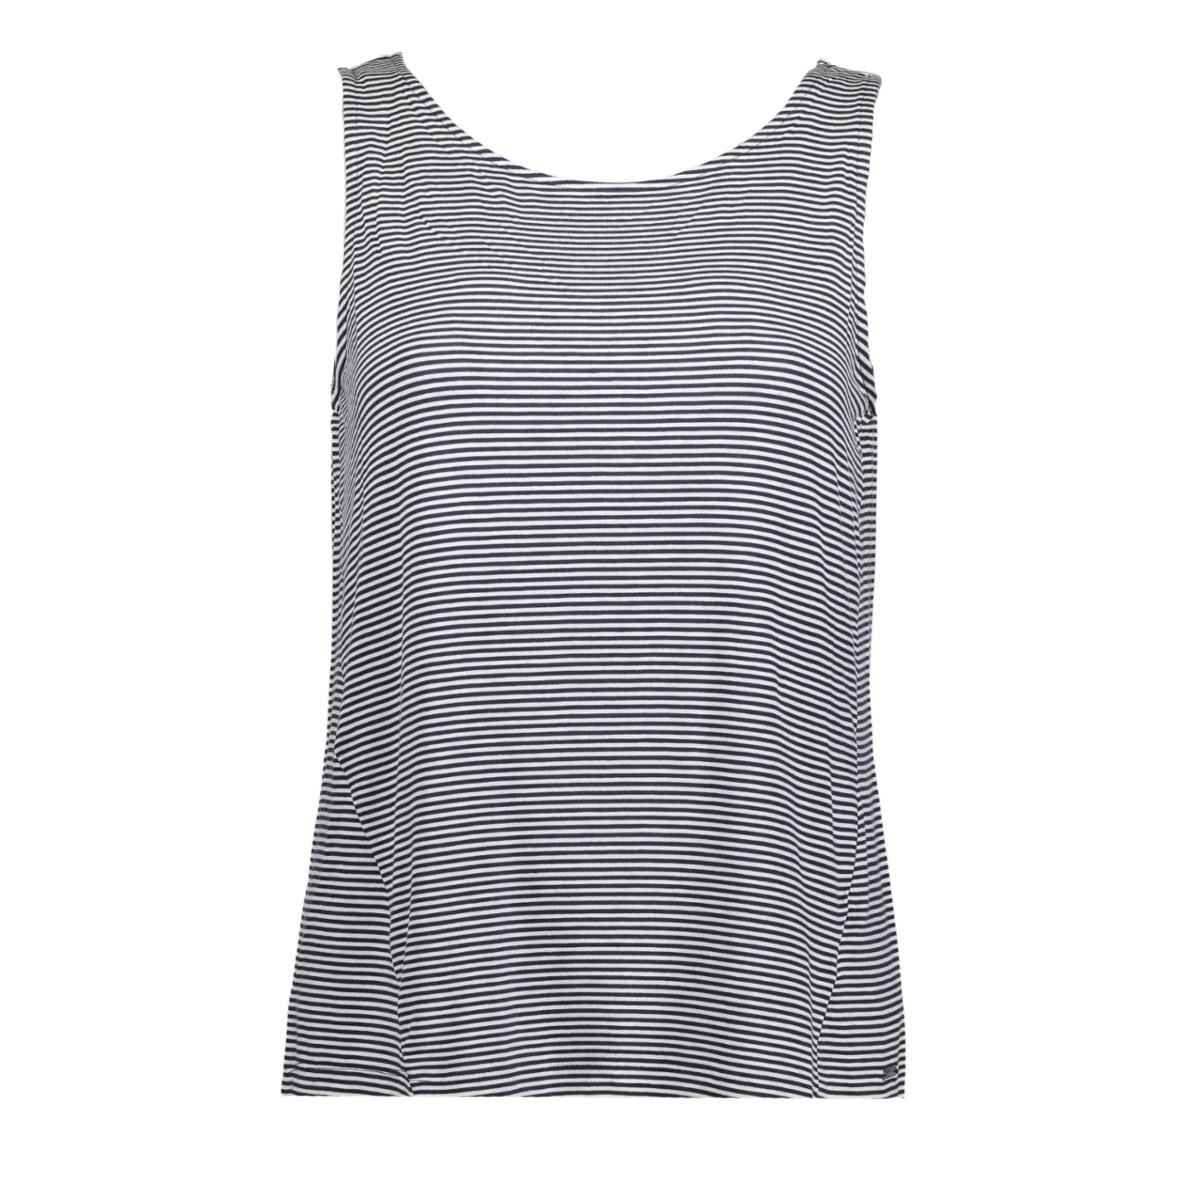 1055074.00.71 tom tailor top 1002